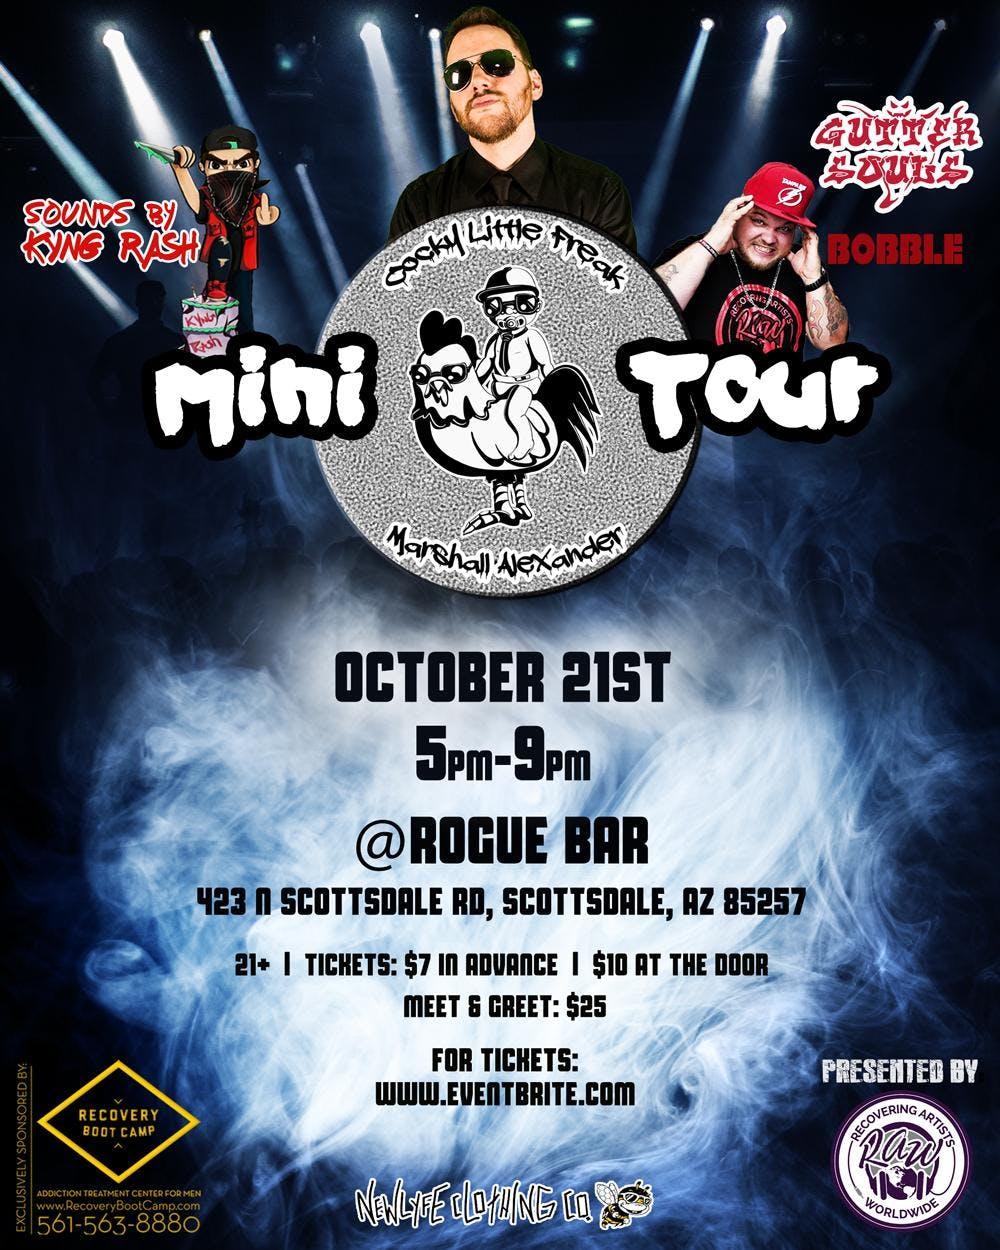 Scottsdale Arizona CLF mini tour Marshall Alexander, Gutter Souls & more